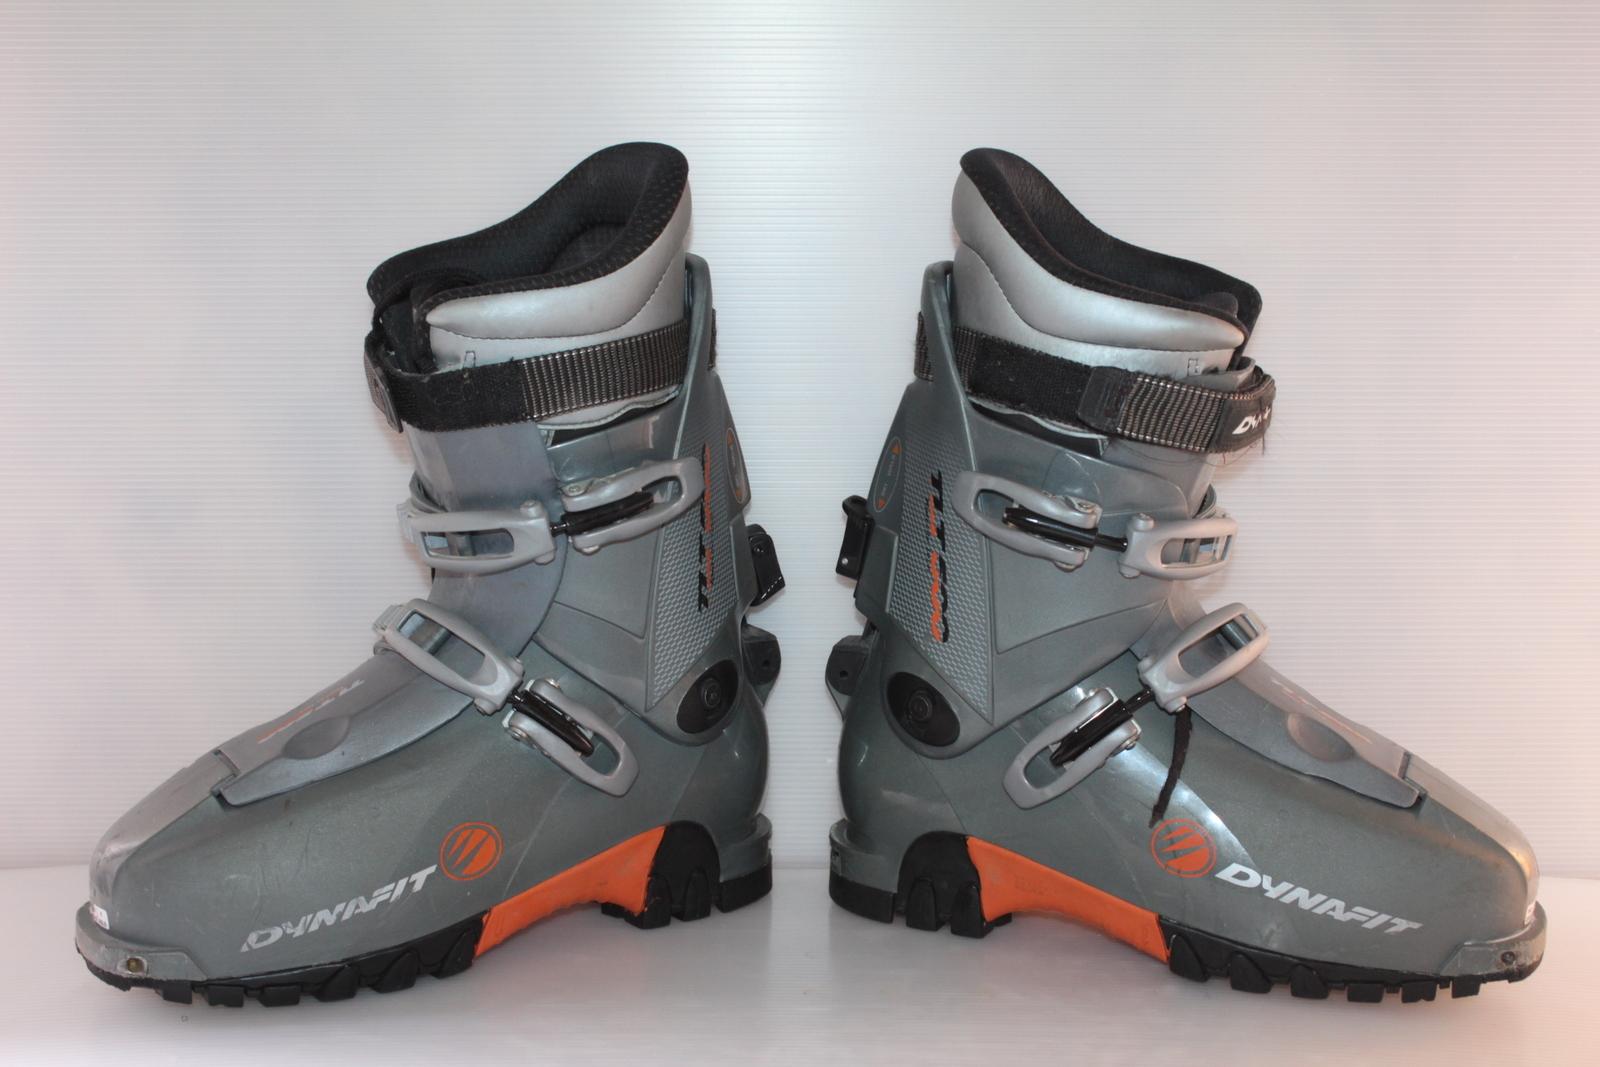 Skialpové boty Dynafit TLT 500 - skialp vel. EU42.5